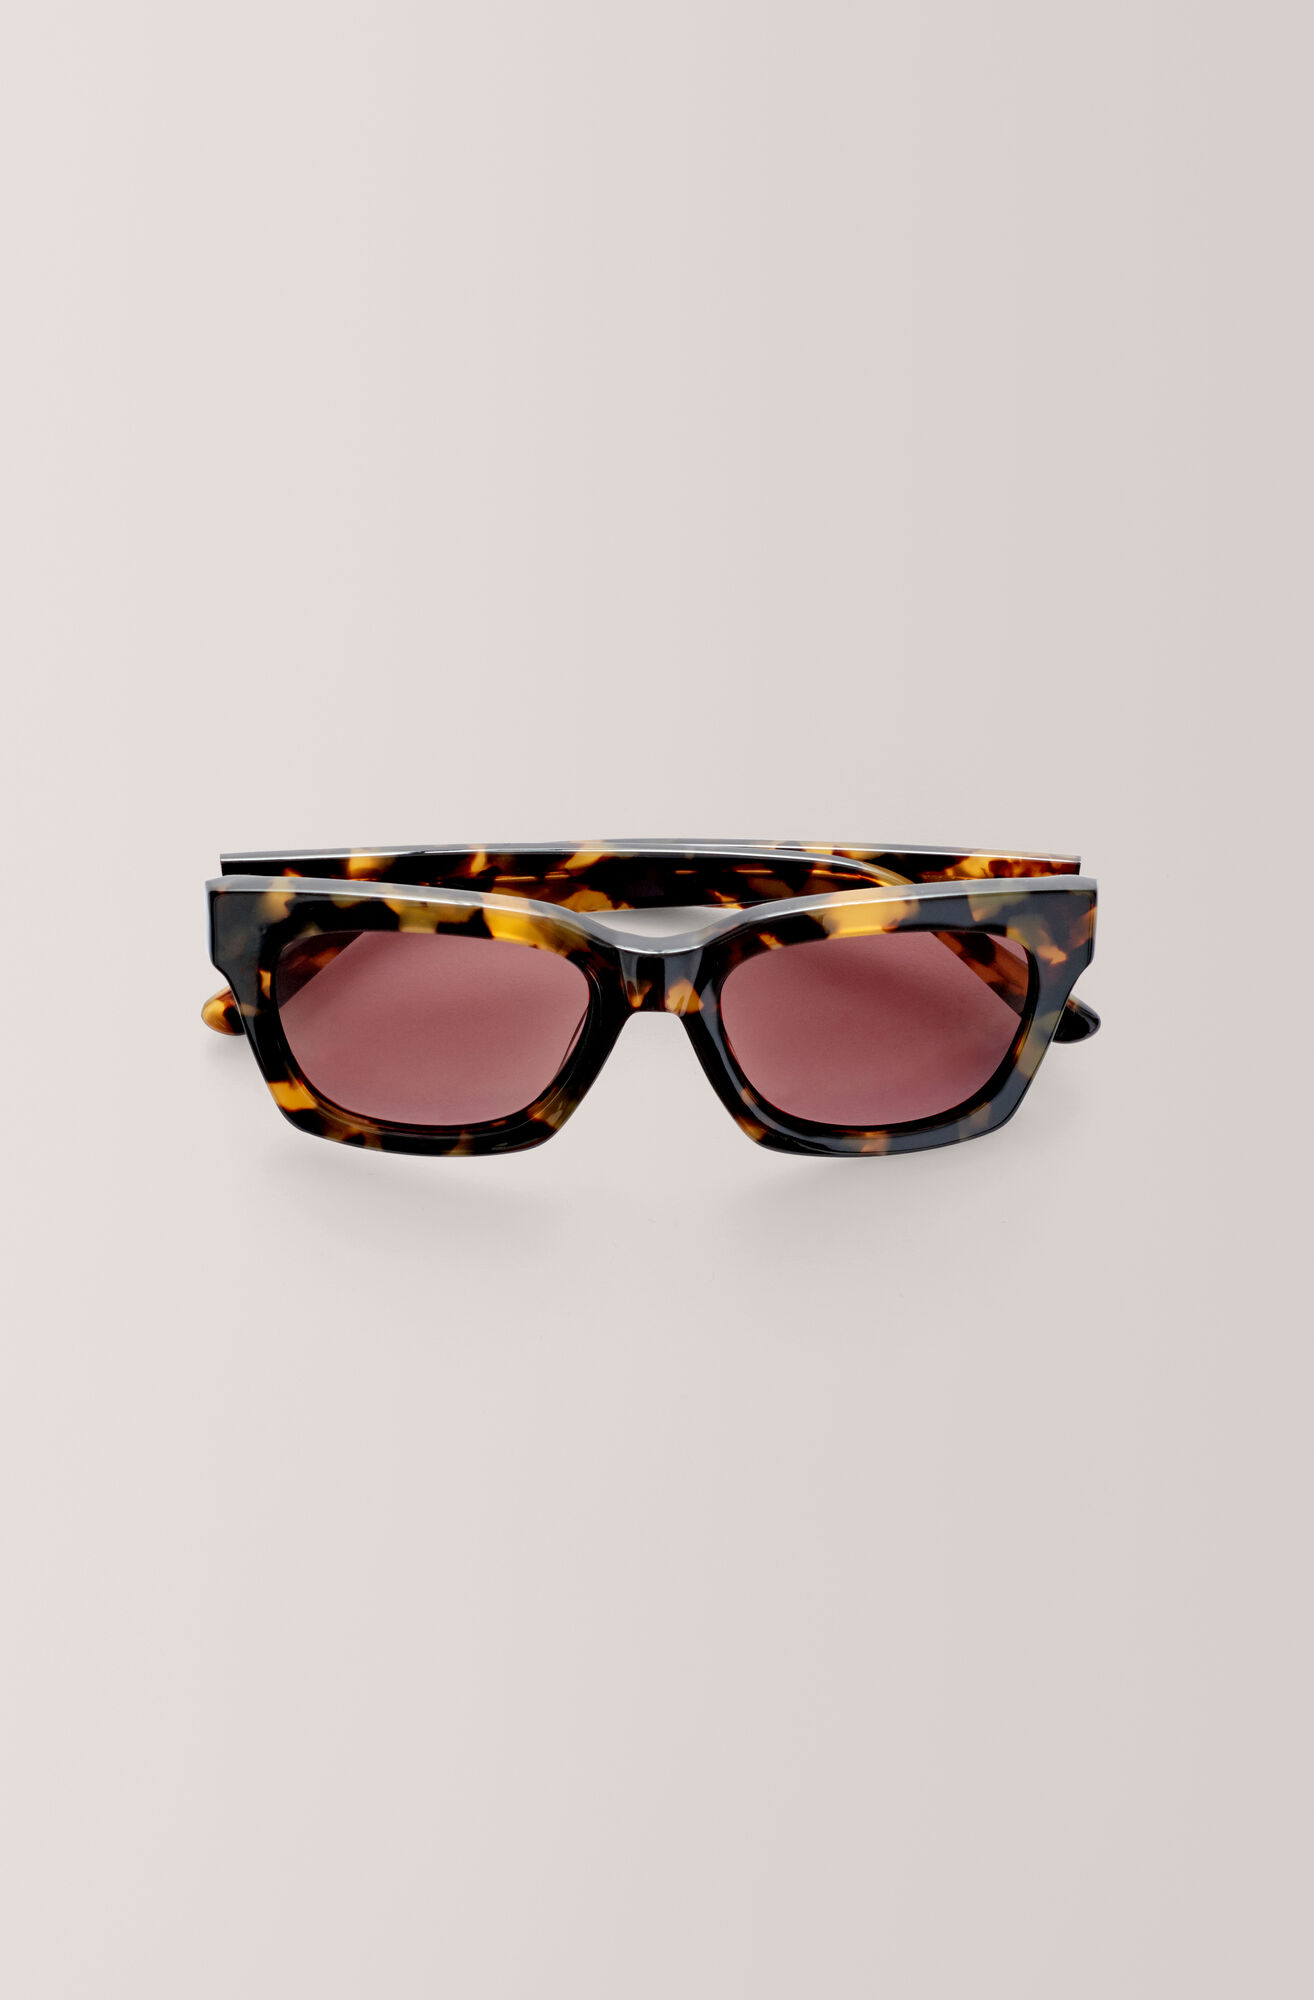 317f548b866c GANNI Alice Sunglasses ( 145.00 GBP )   Shop your new Alice ...